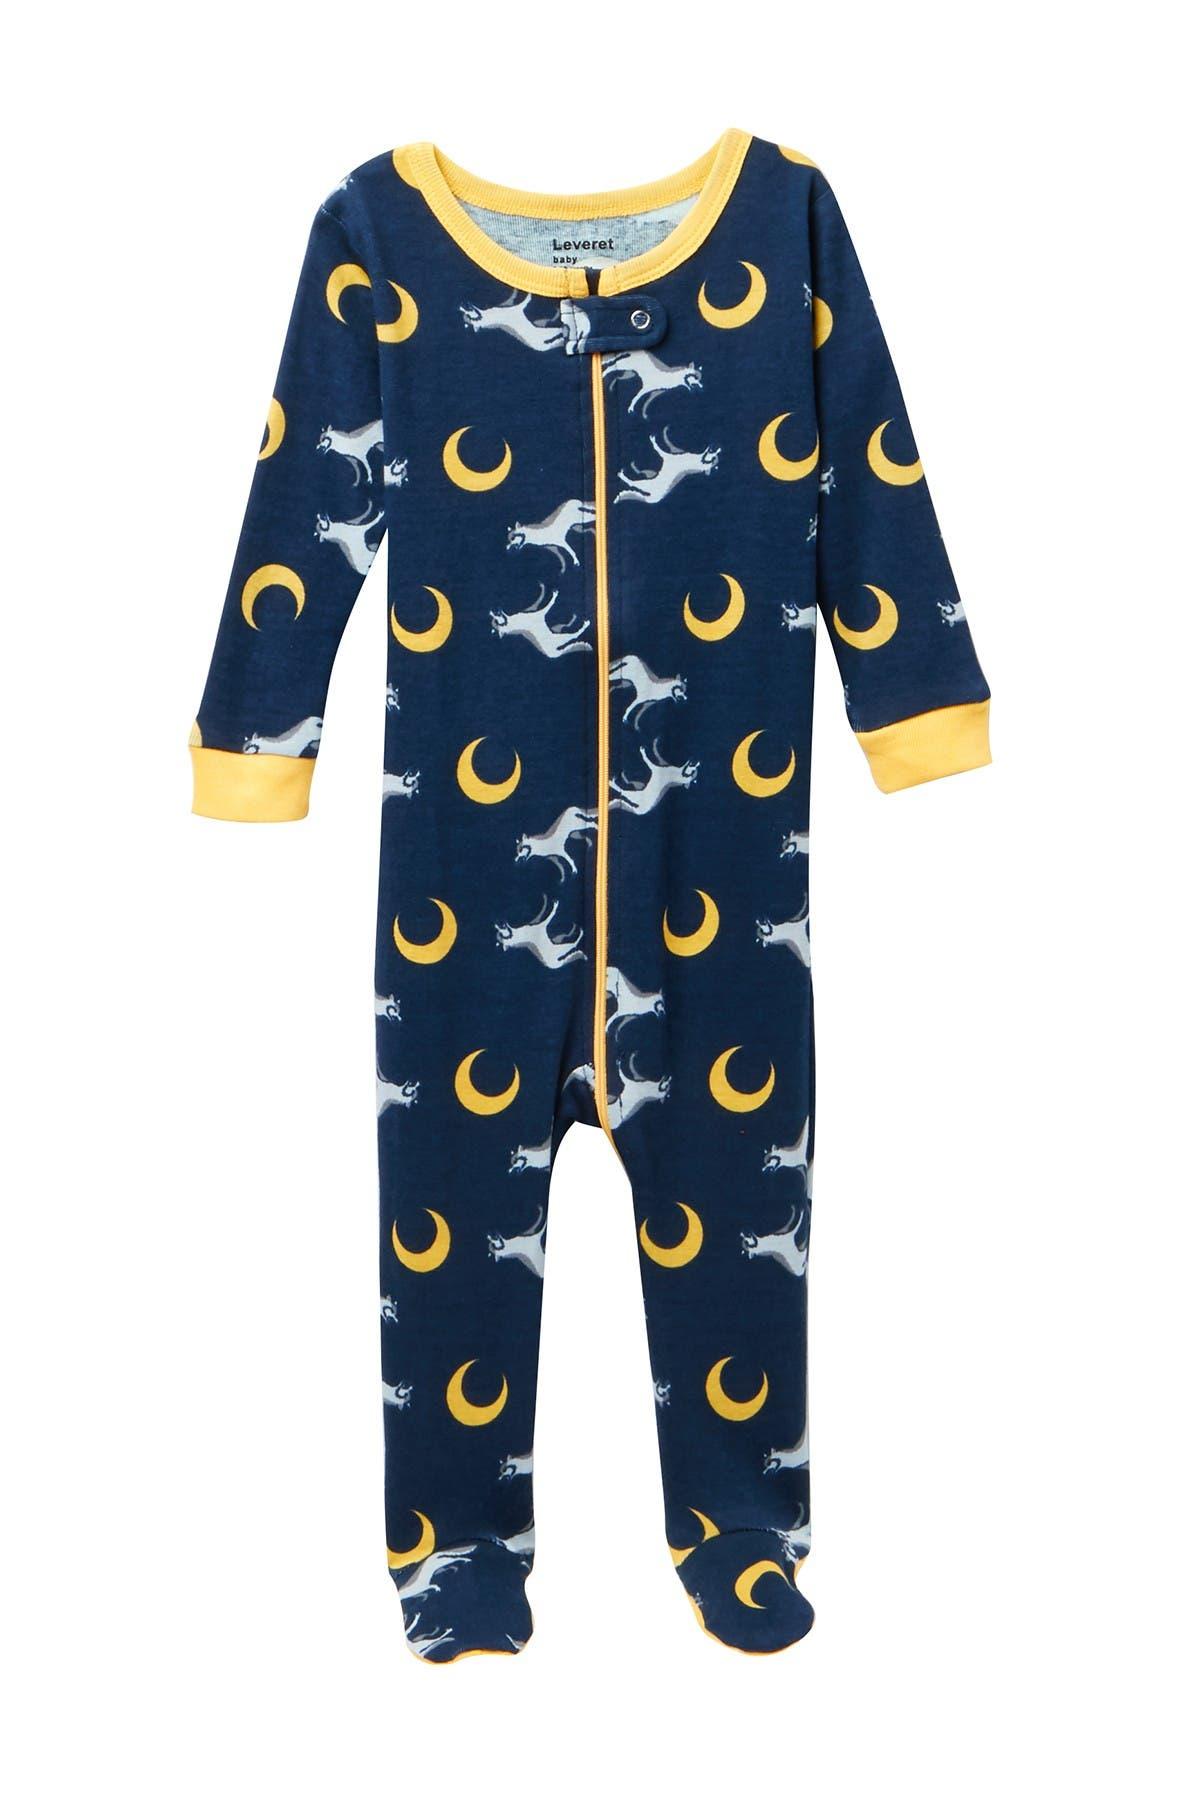 Image of Leveret Wolf Footed Pajama Sleeper